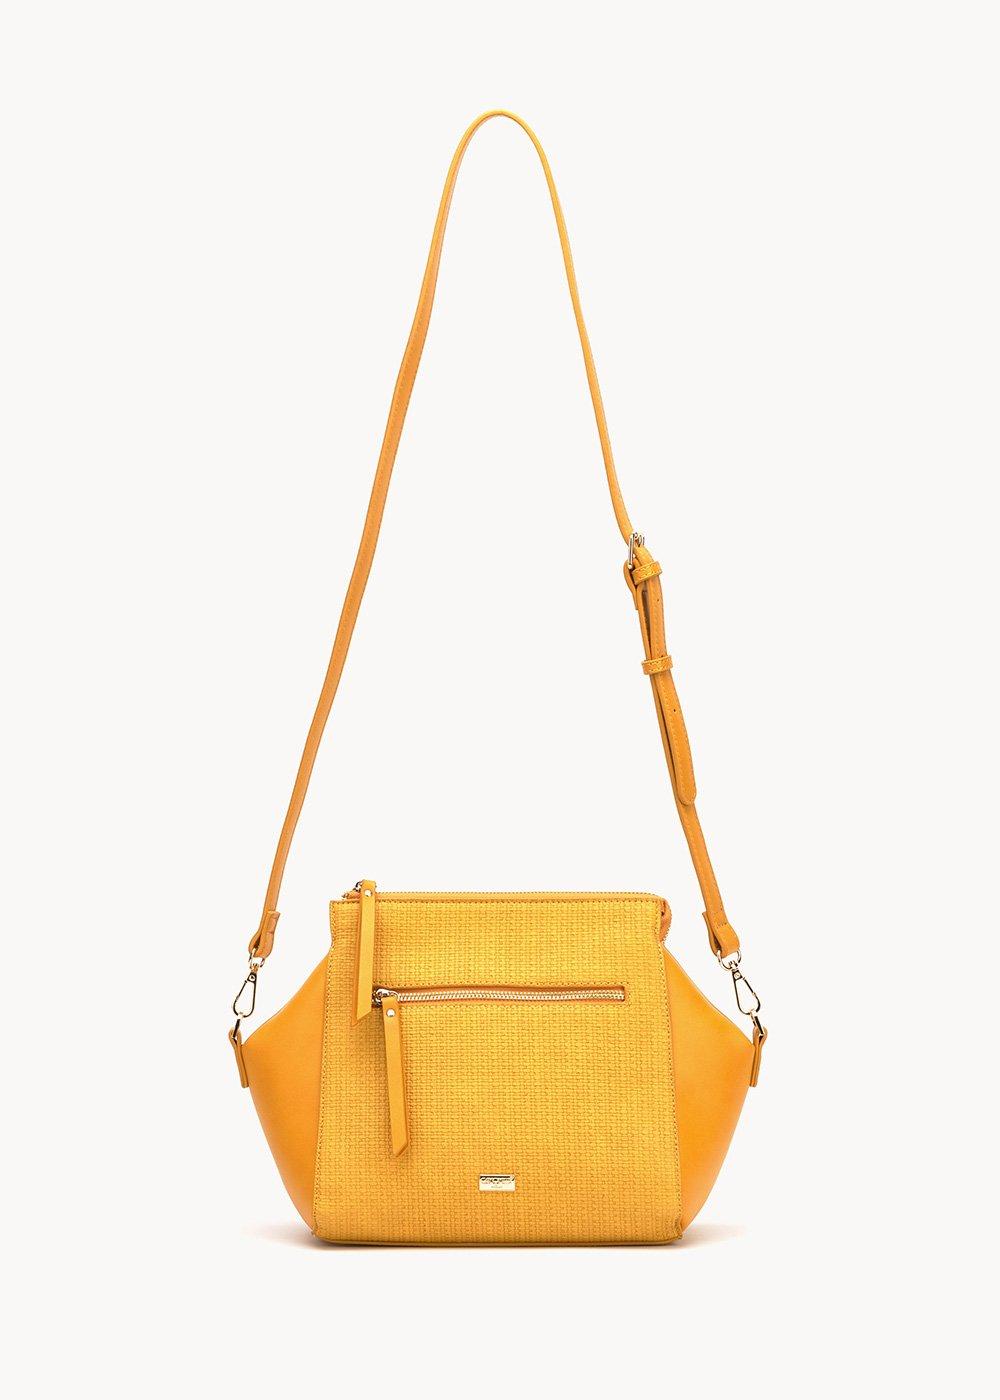 Blasie shoulder bag - Sole - Woman